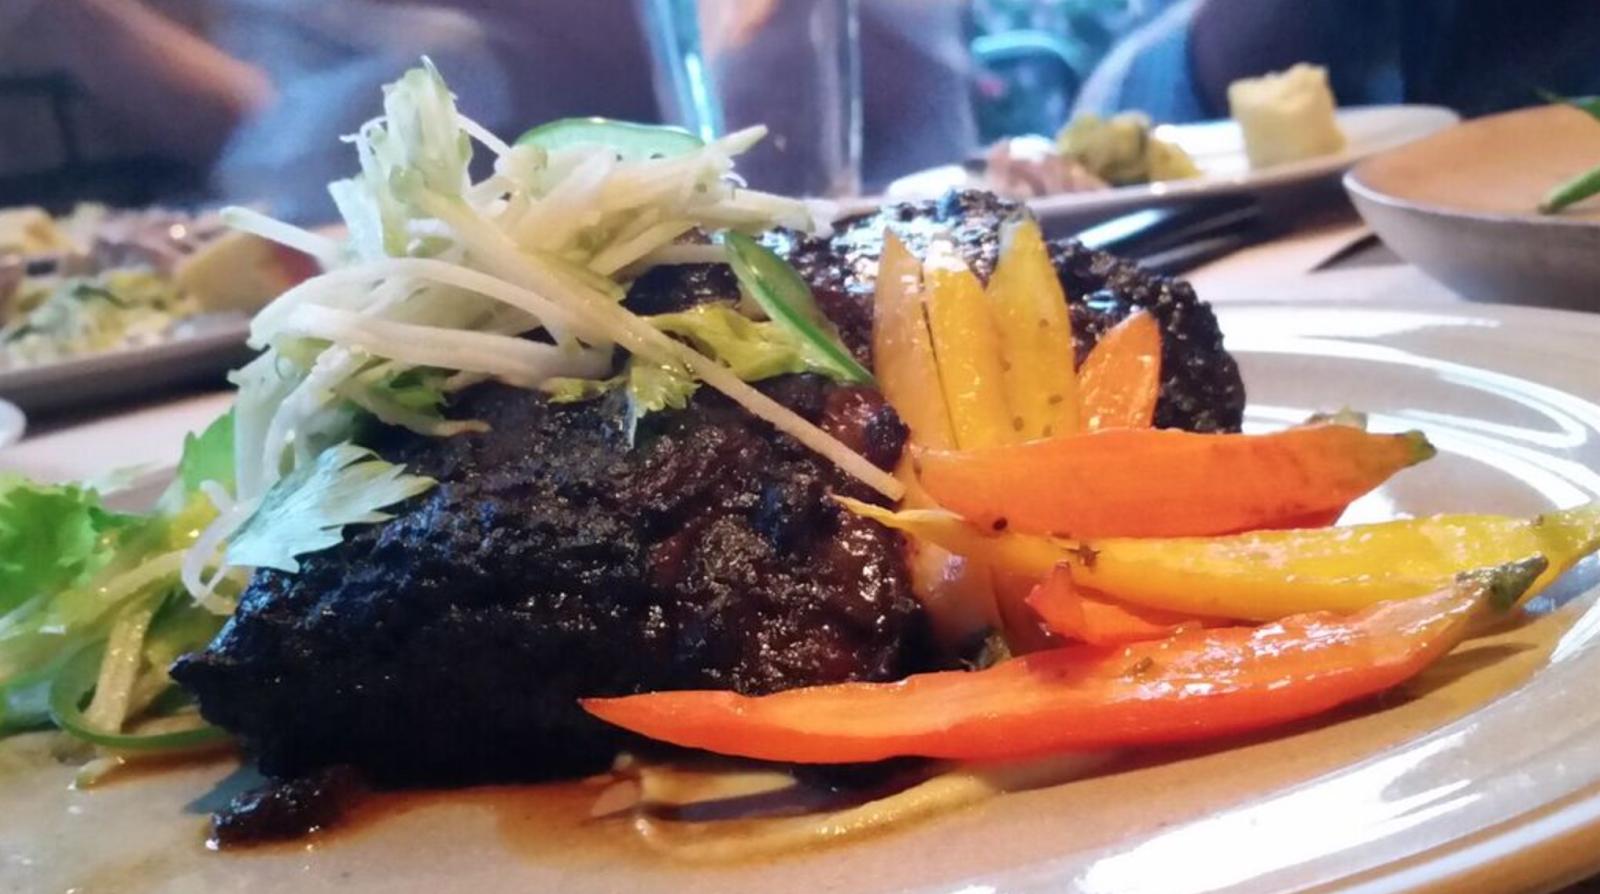 hearth roasted red snapper lemongrass spoon bread summer squash 26 - Slate Restaurant 2015